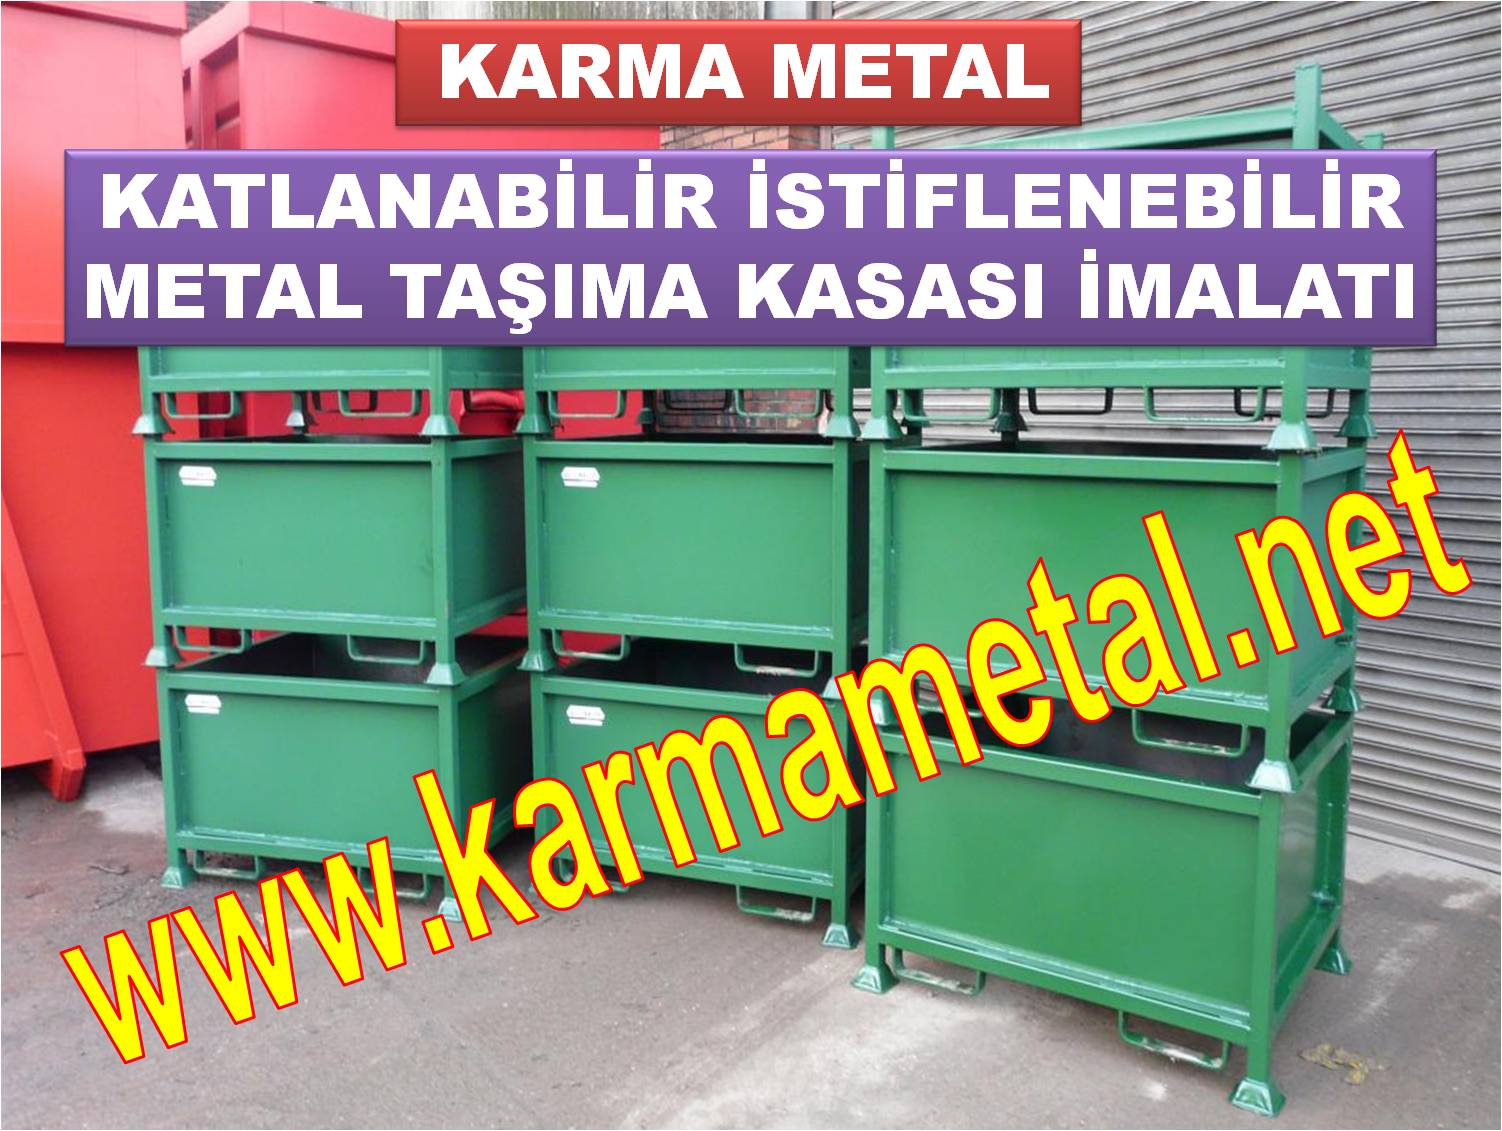 katlanabilir_istiflenebilir_metal_tasima_kasasi_sevkiyat_kasalari_istanbul (4)